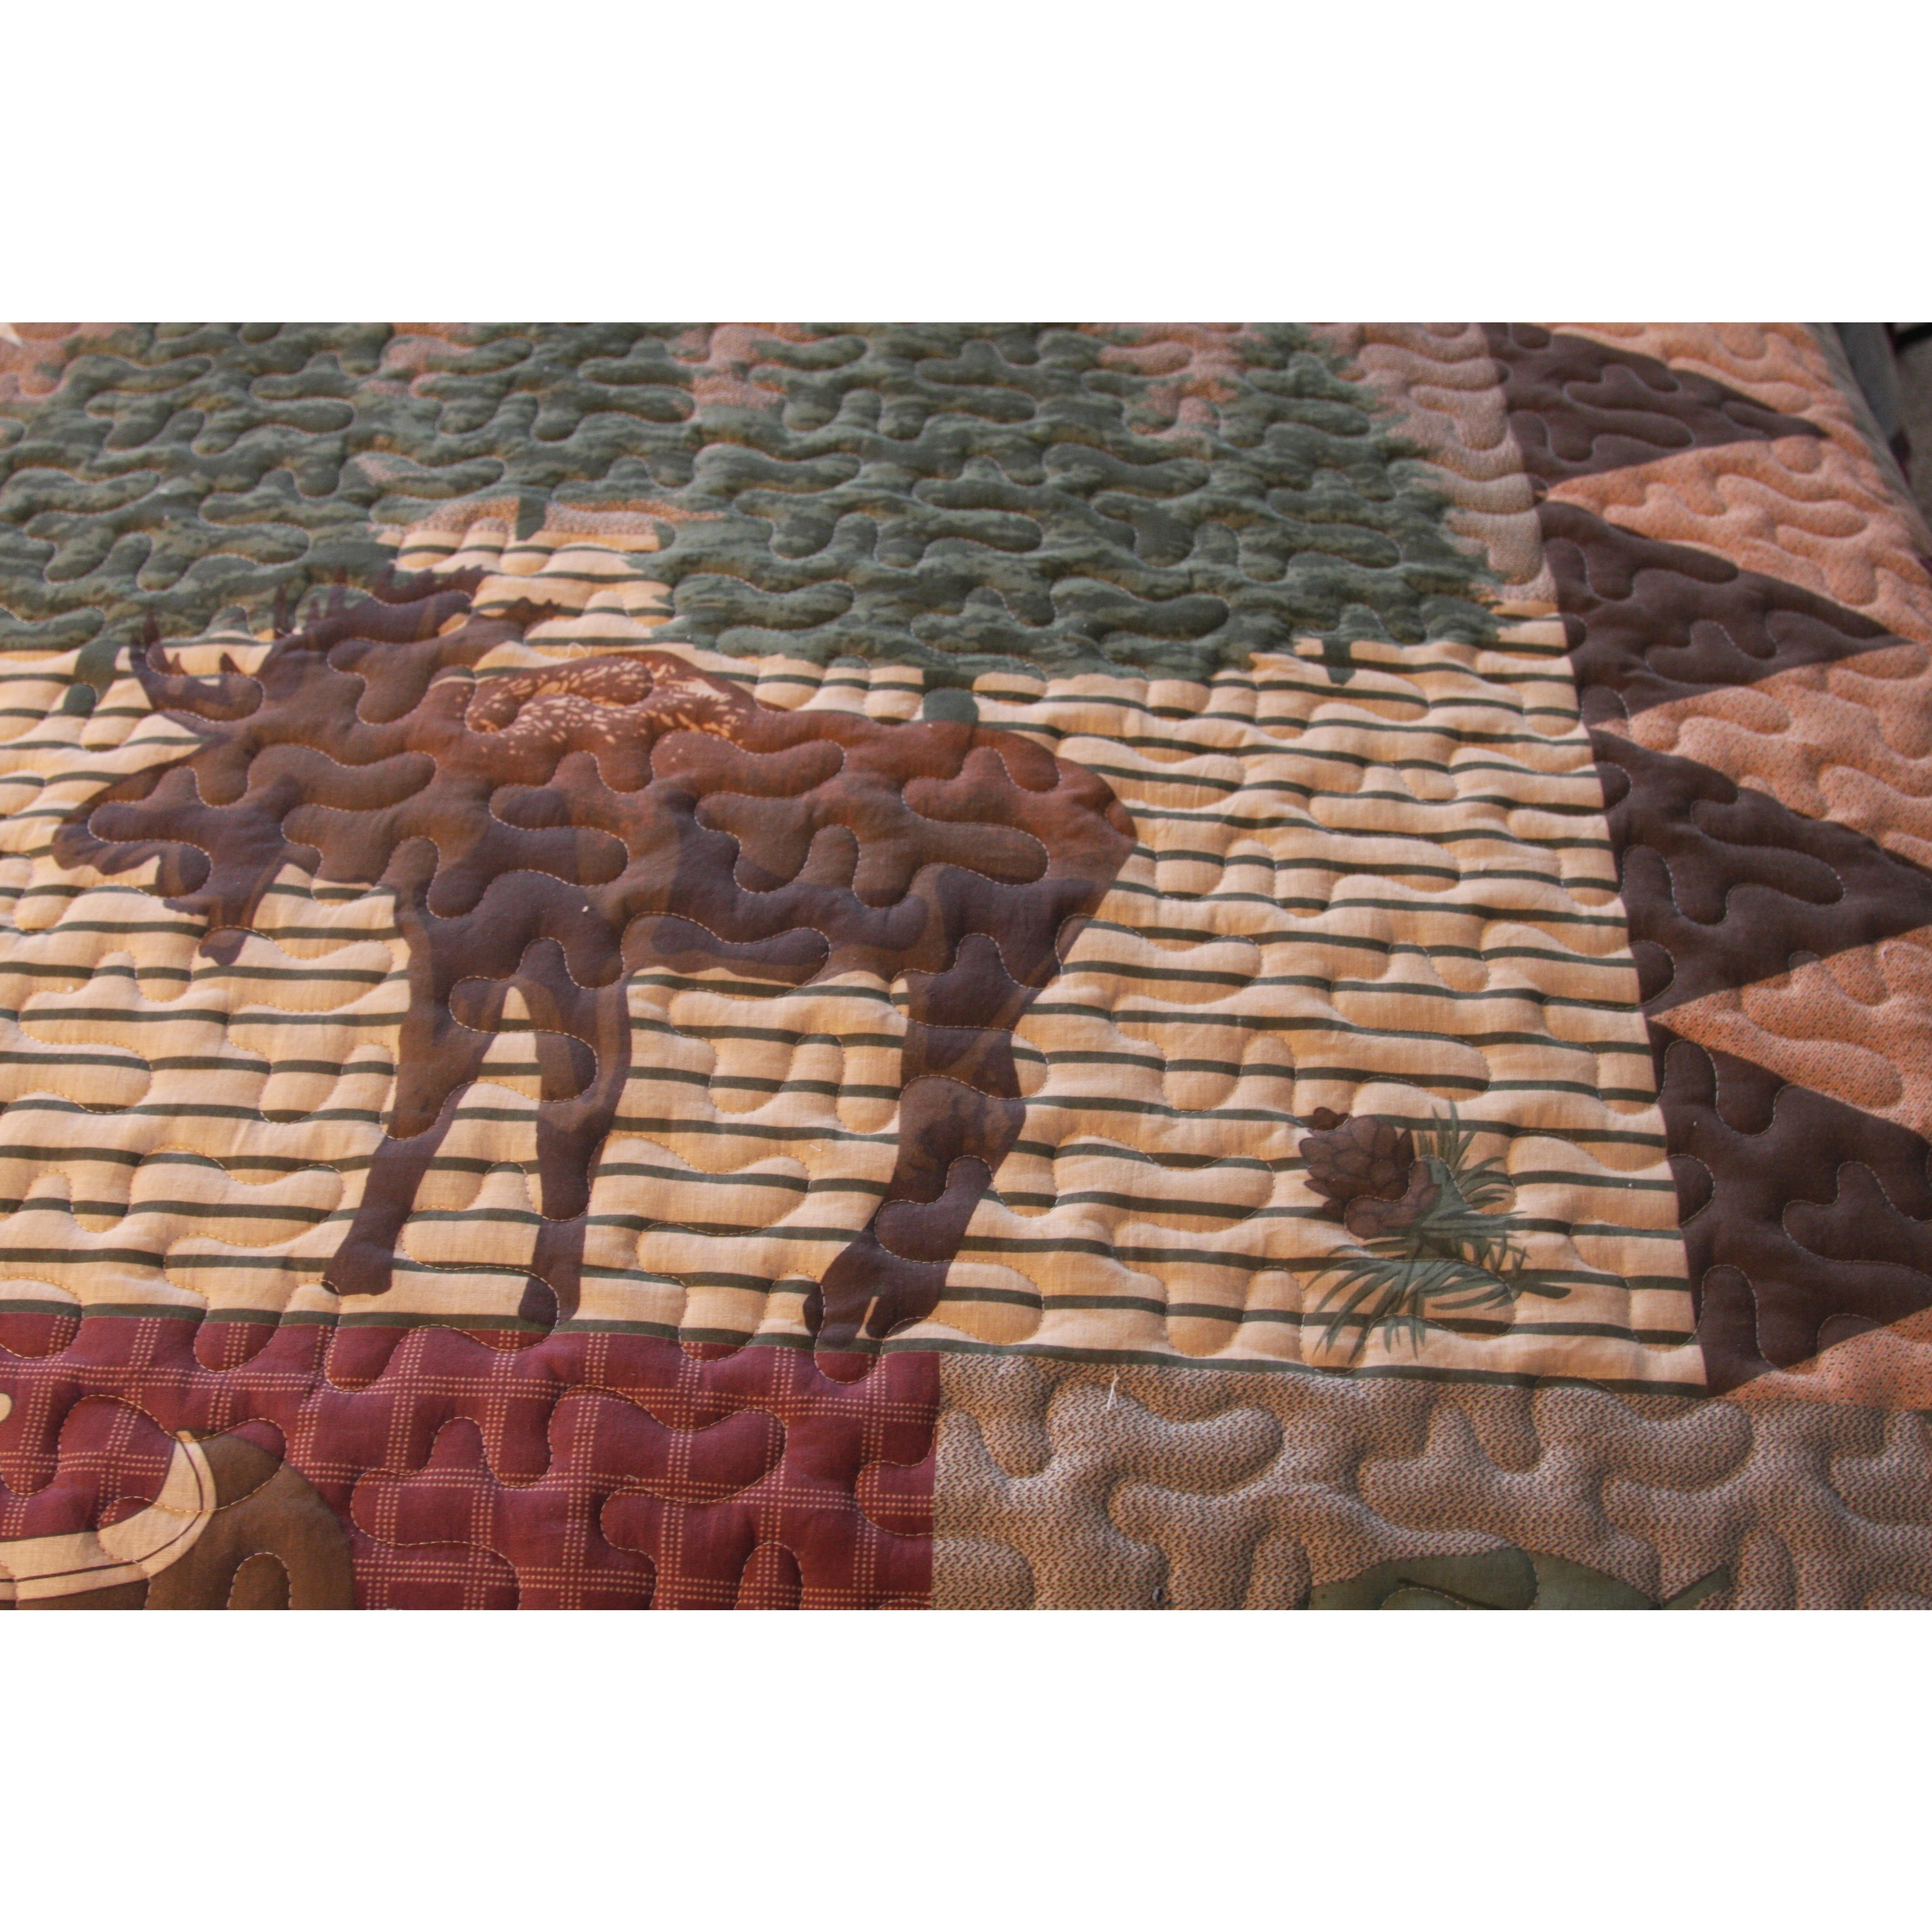 Greenland Home Fashions Moose Lodge 3-piece Quilt Set - Free ... : moose lodge quilt set - Adamdwight.com